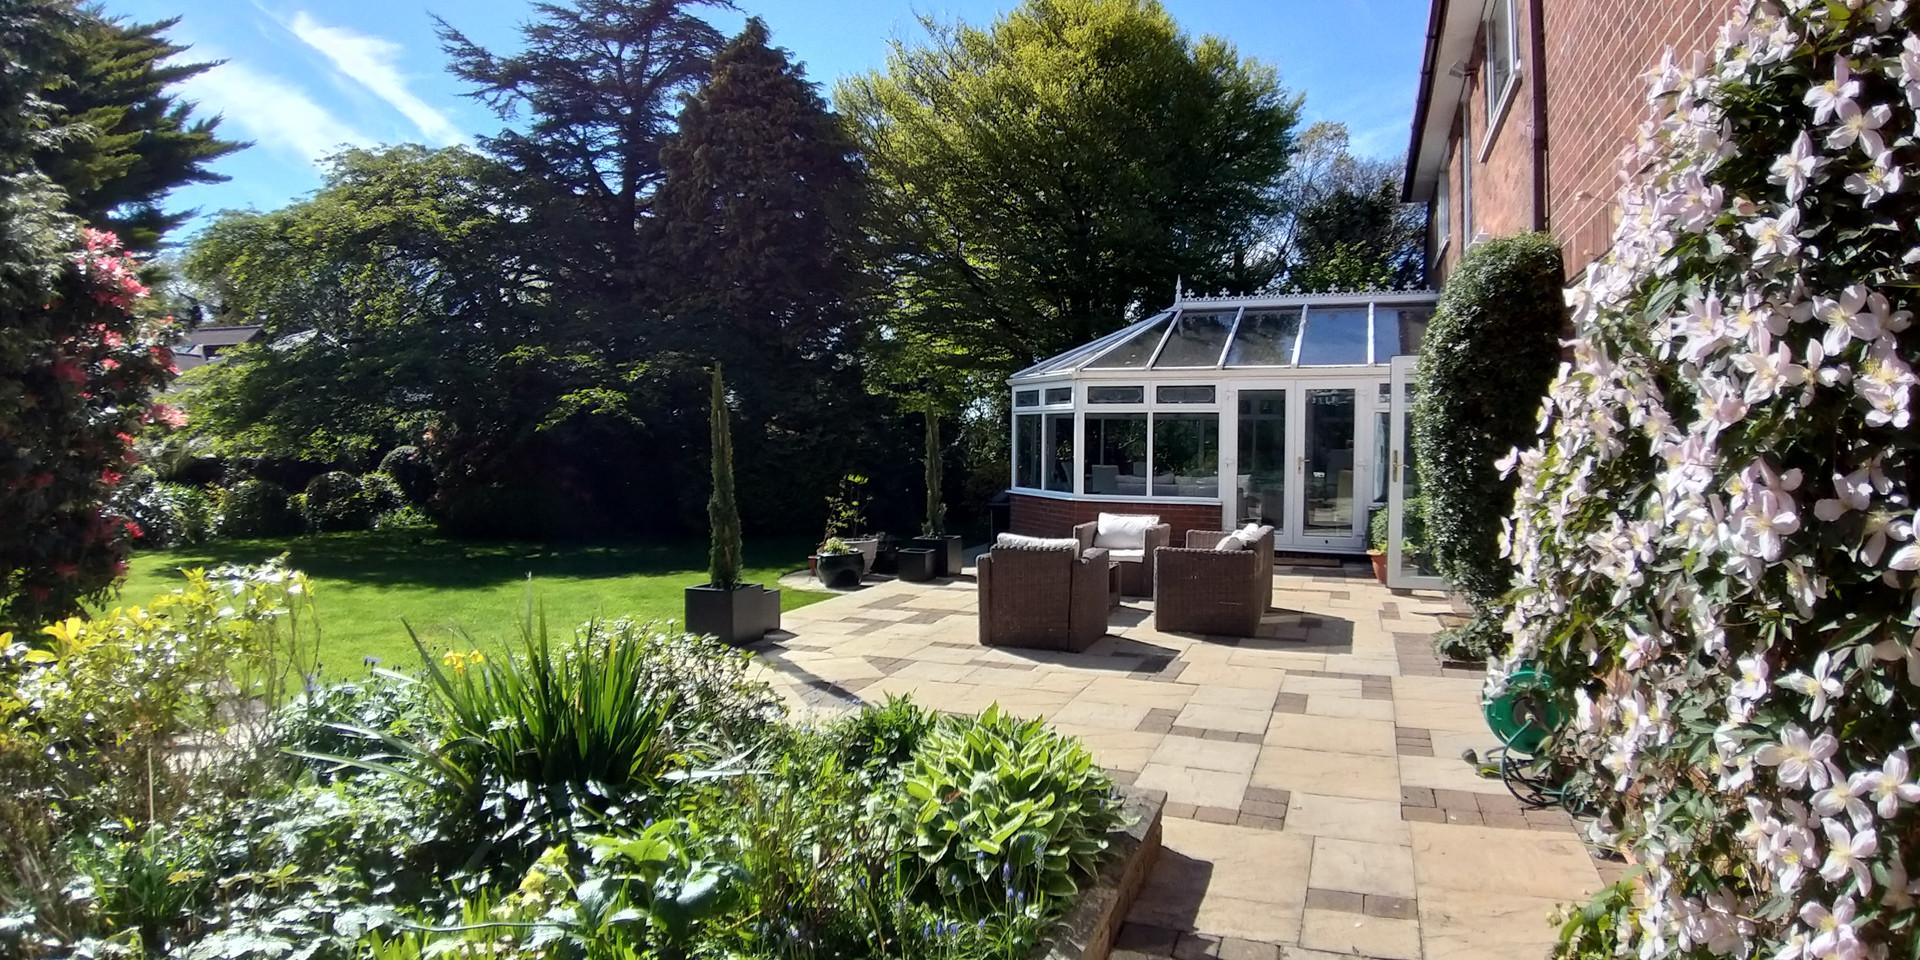 Hillingford's sunny patio